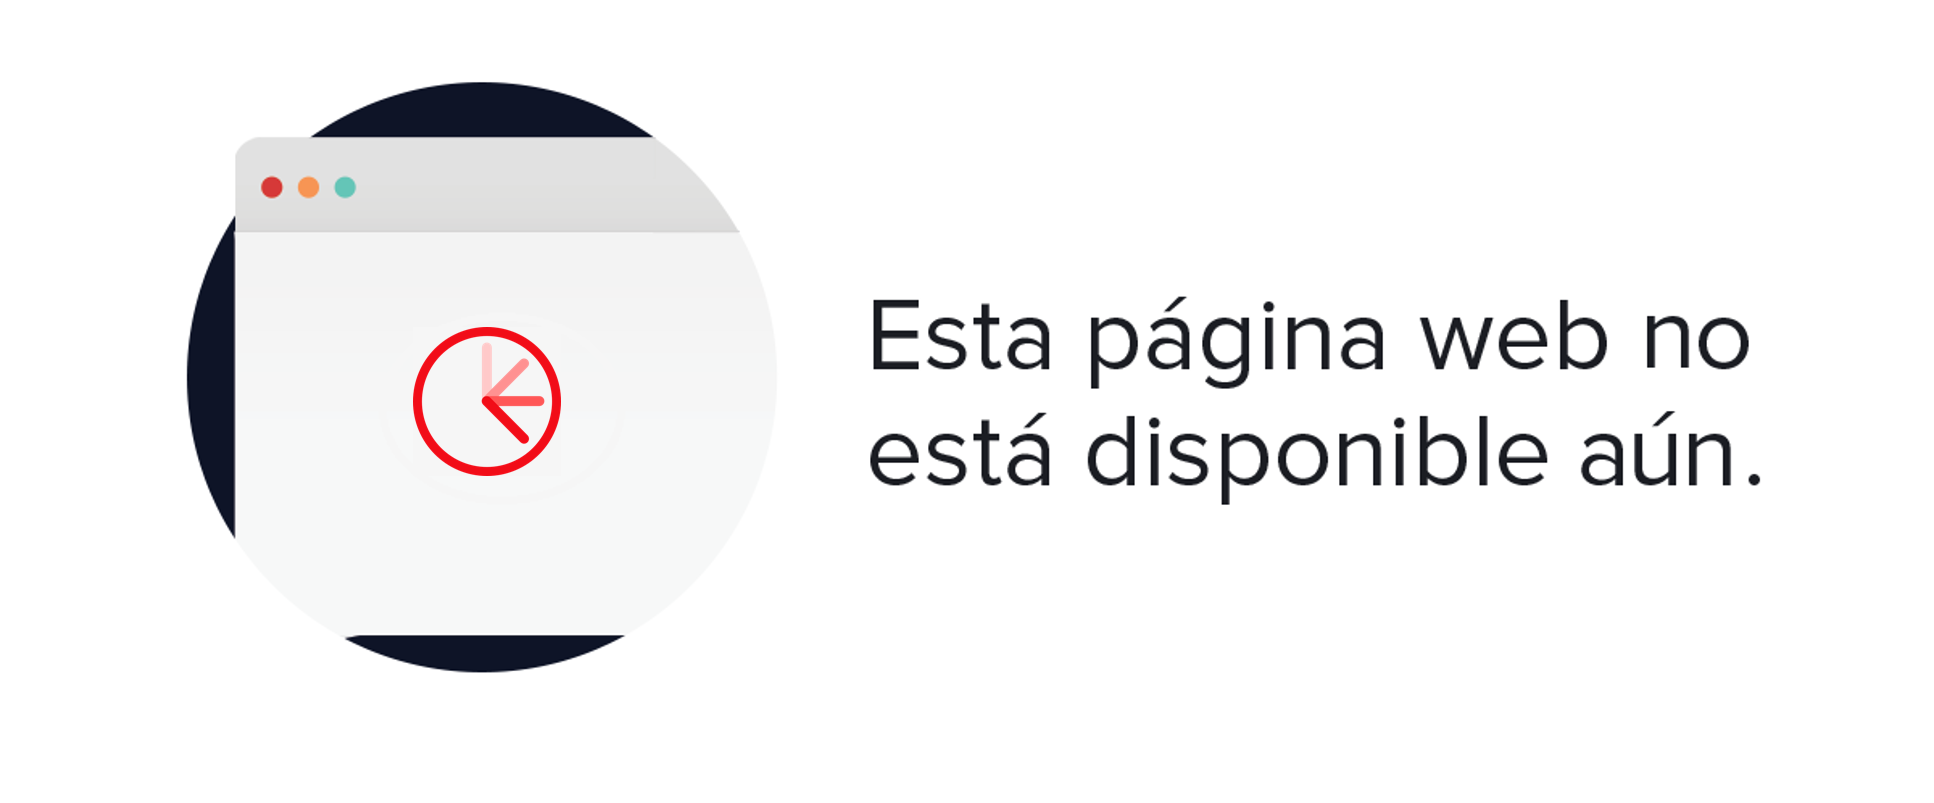 Jocavi - Pantalón pitillo de mujer Jocavi con cinco bolsillos Beige 001015760301059038 - ZFYHUHE